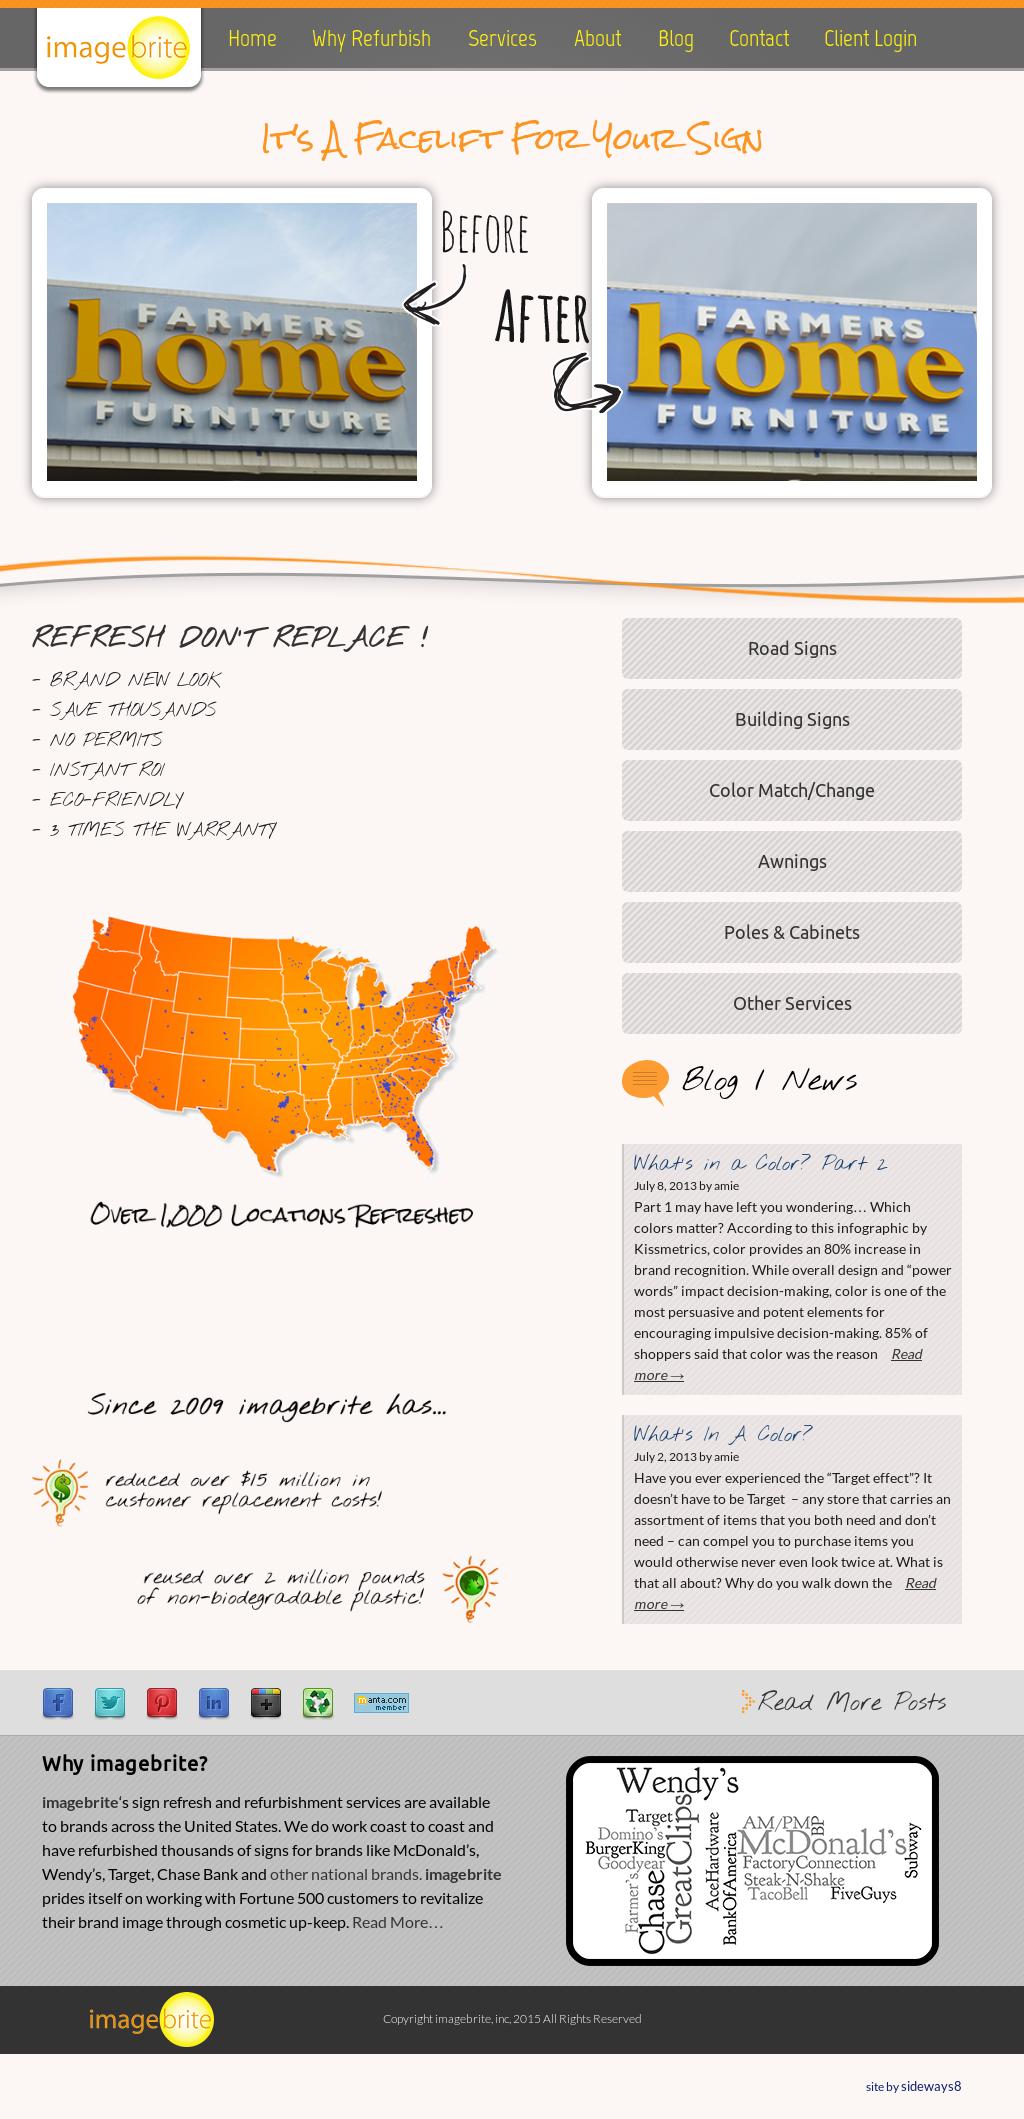 ImageBrite Competitors, Revenue and Employees - Owler